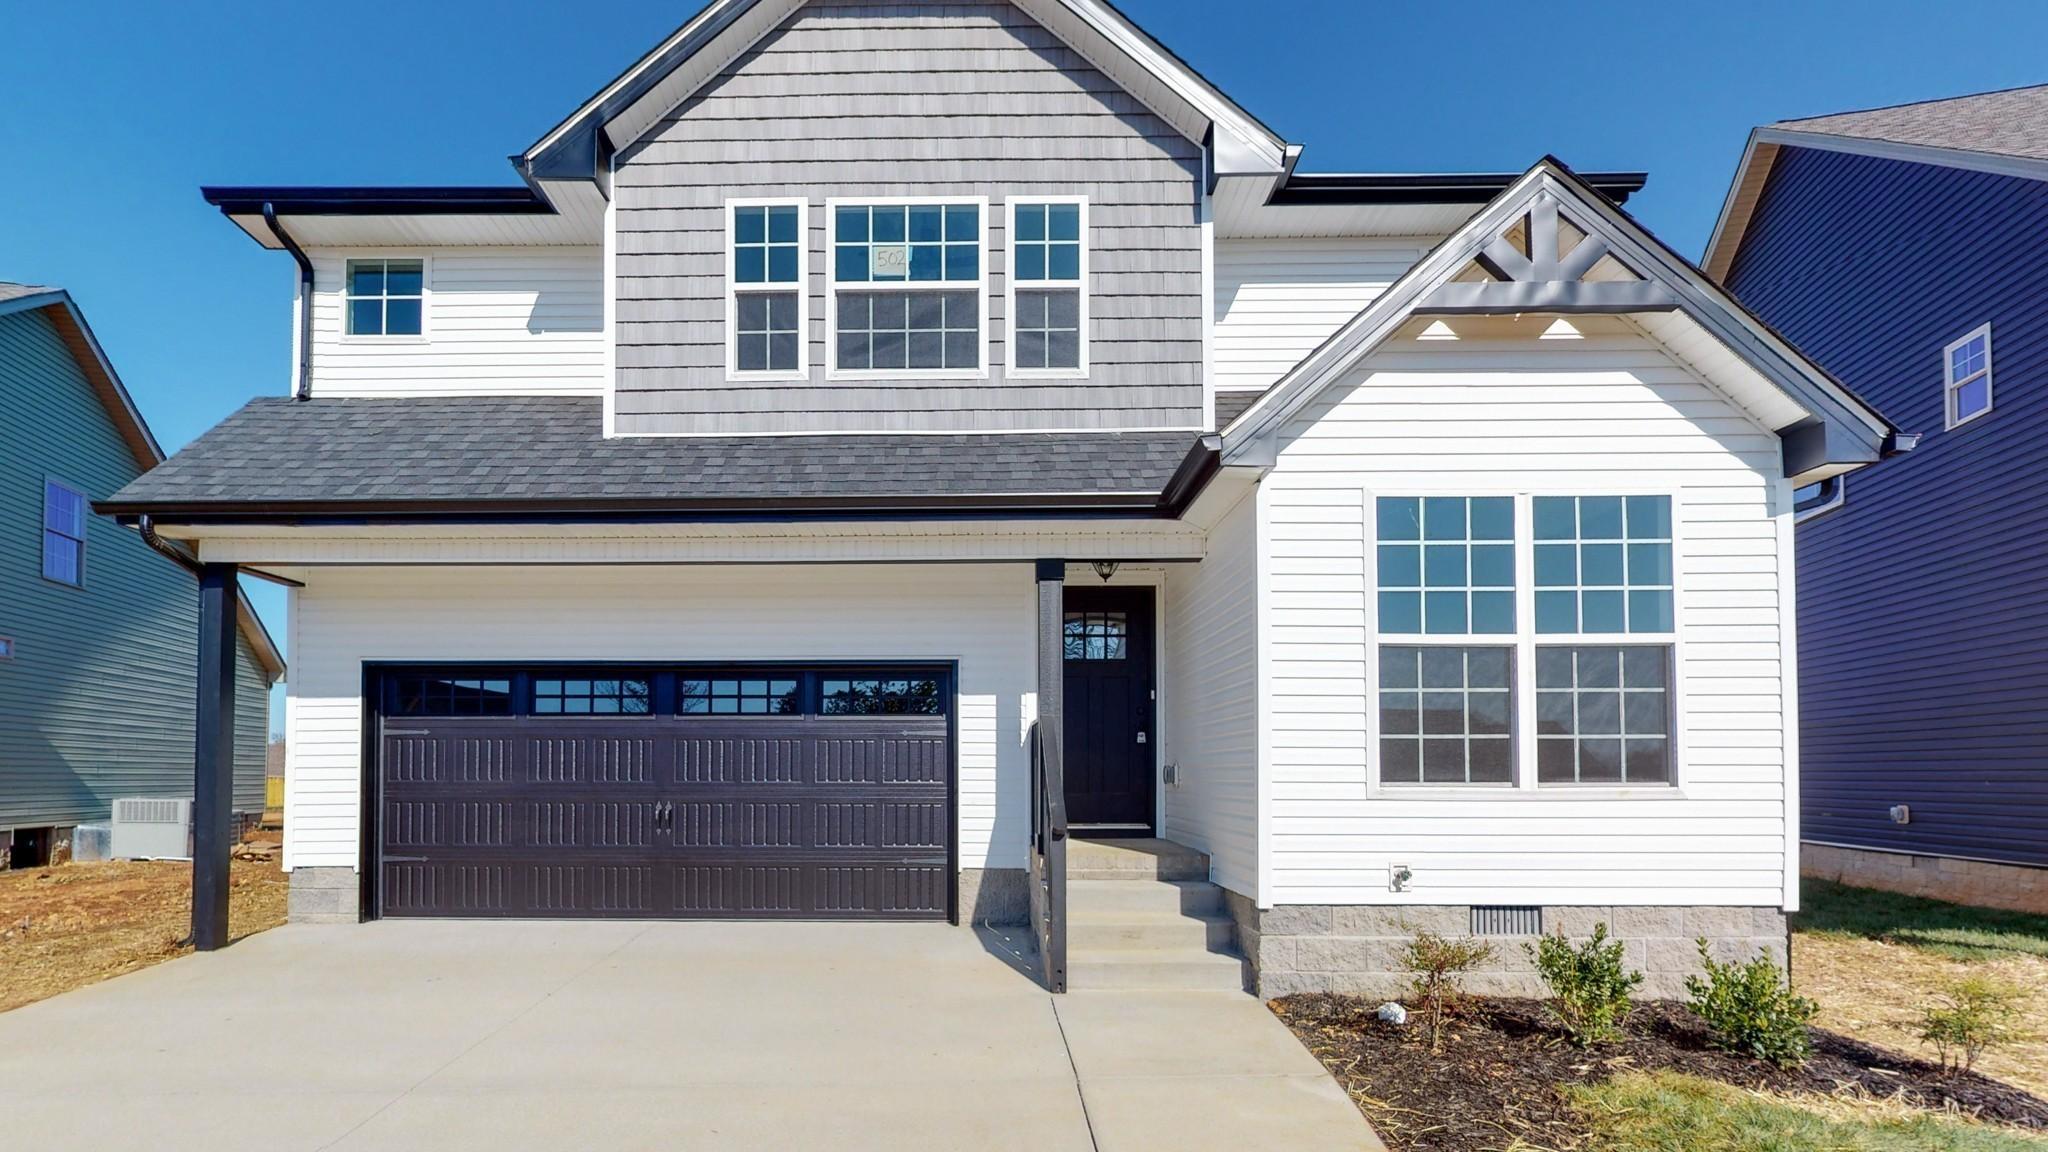 31 Woodall Property Photo - Trenton, KY real estate listing